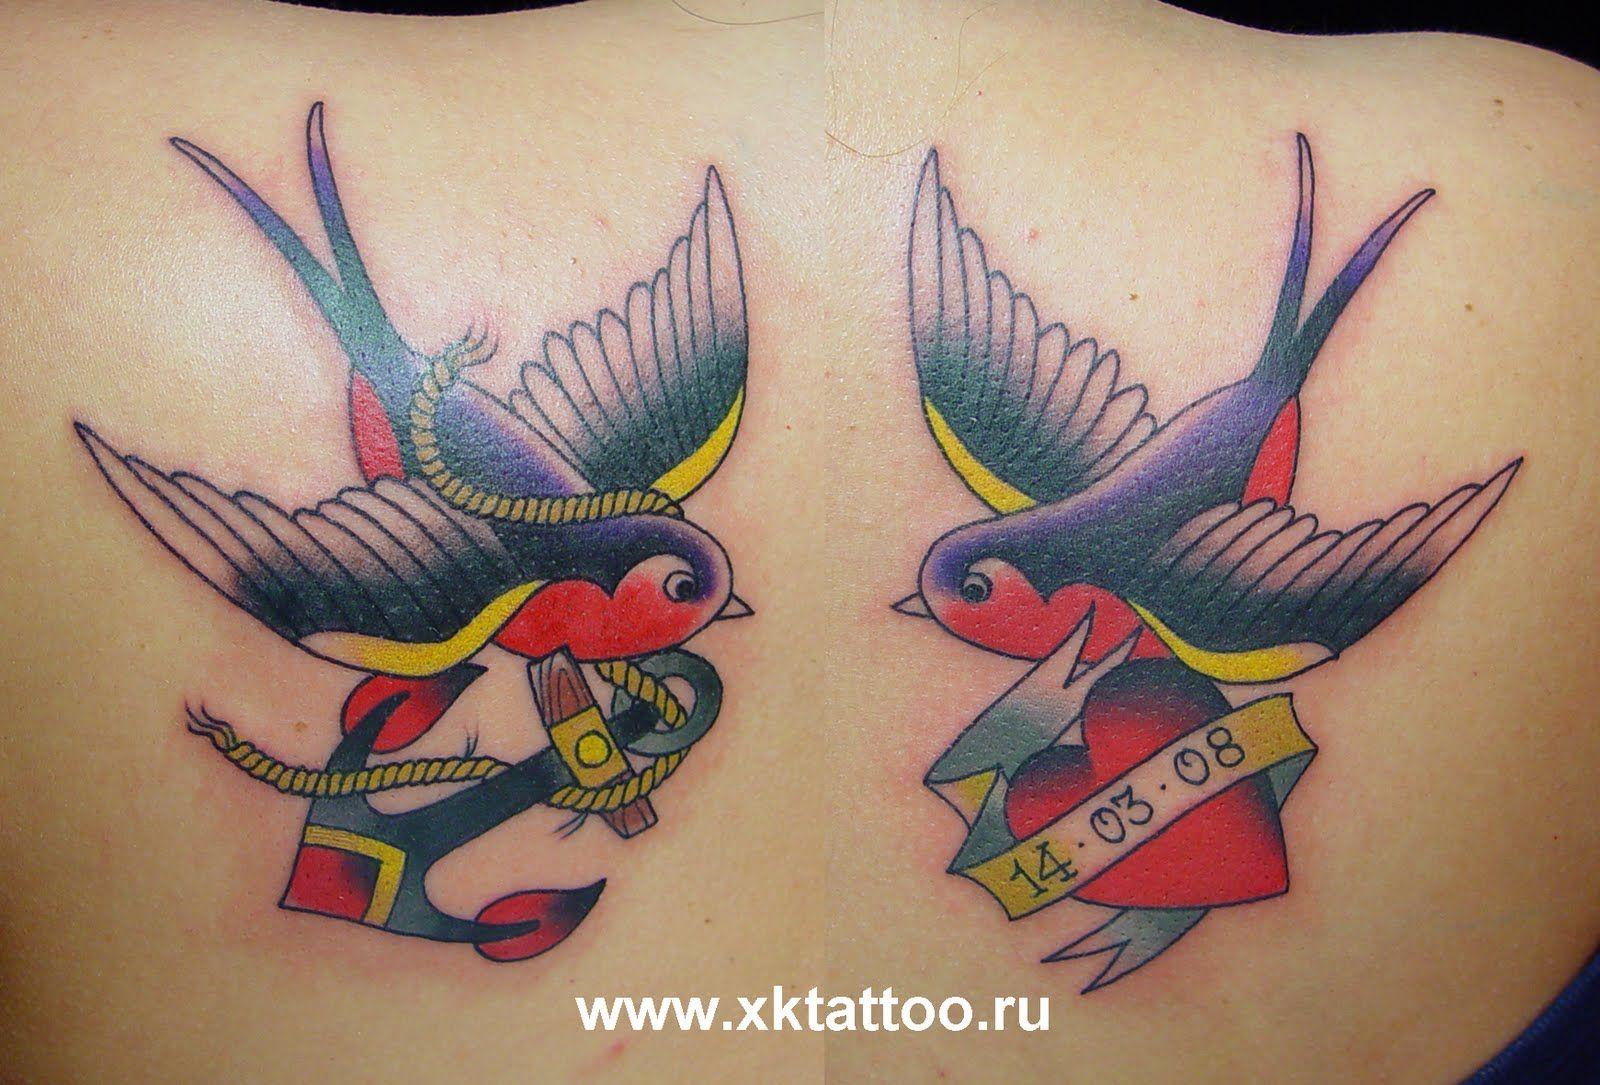 traditional tattoo | Baby Dragon Year: Inspiration ... - photo#30